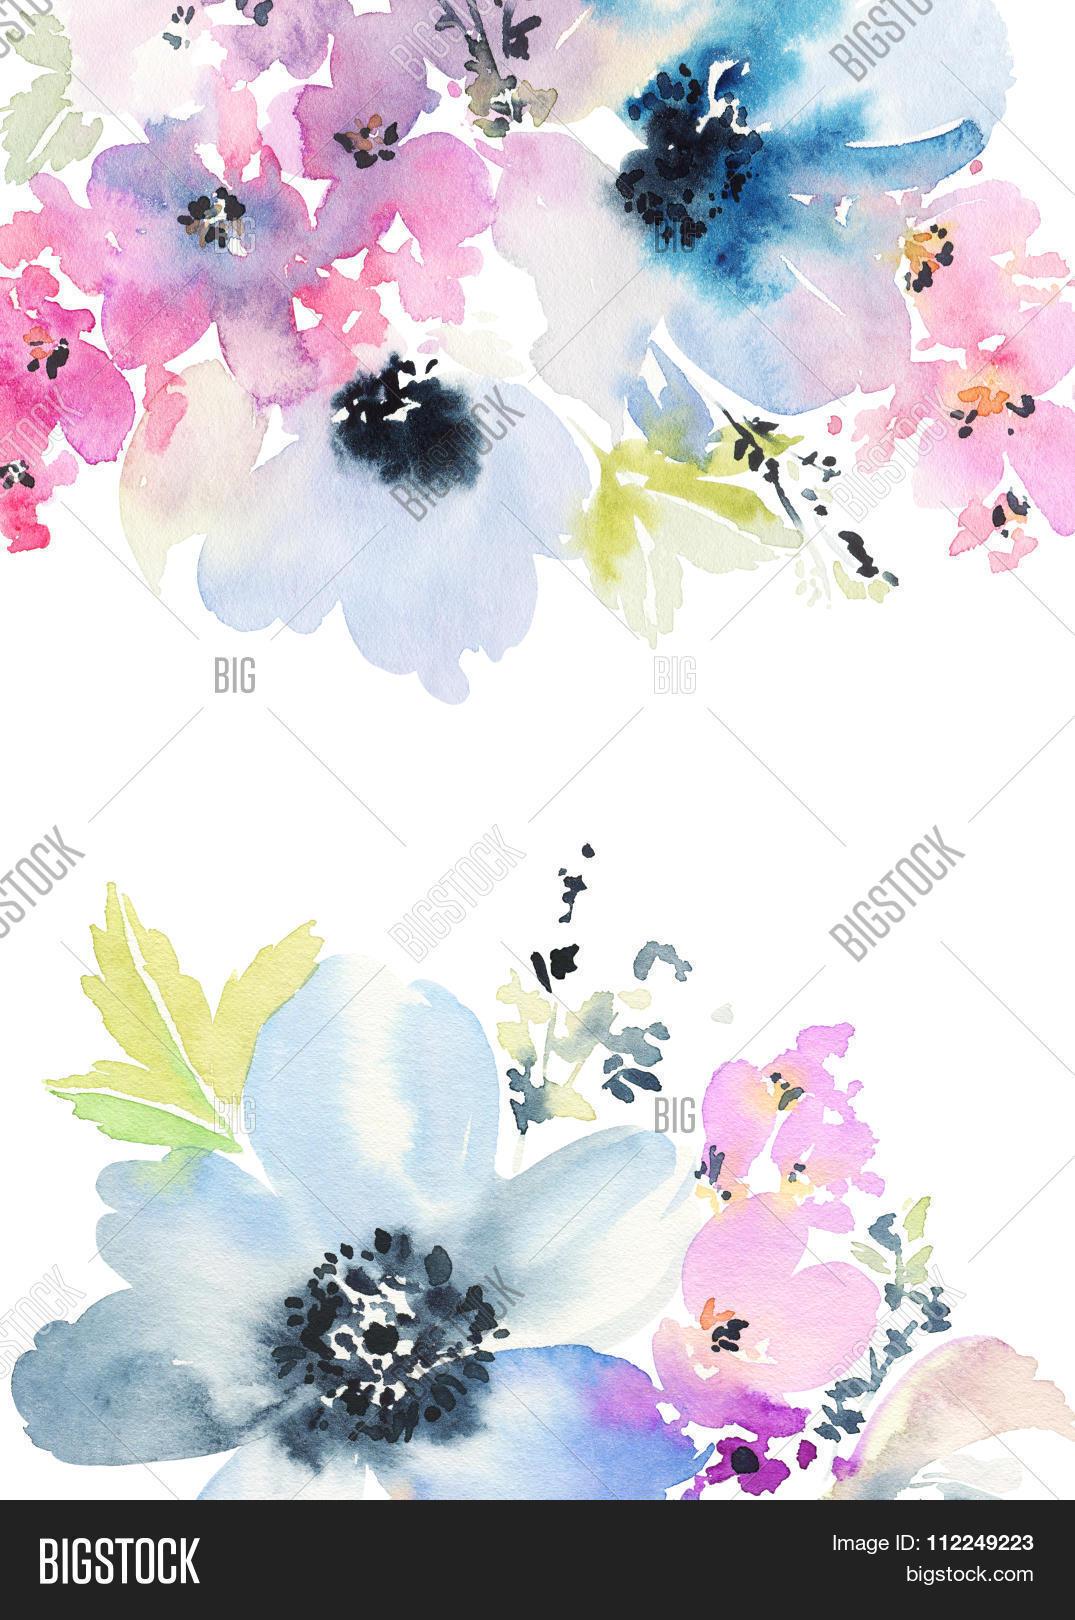 Greeting card flowers image photo free trial bigstock greeting card with flowers pastel colors handmade watercolor painting wedding birthday izmirmasajfo